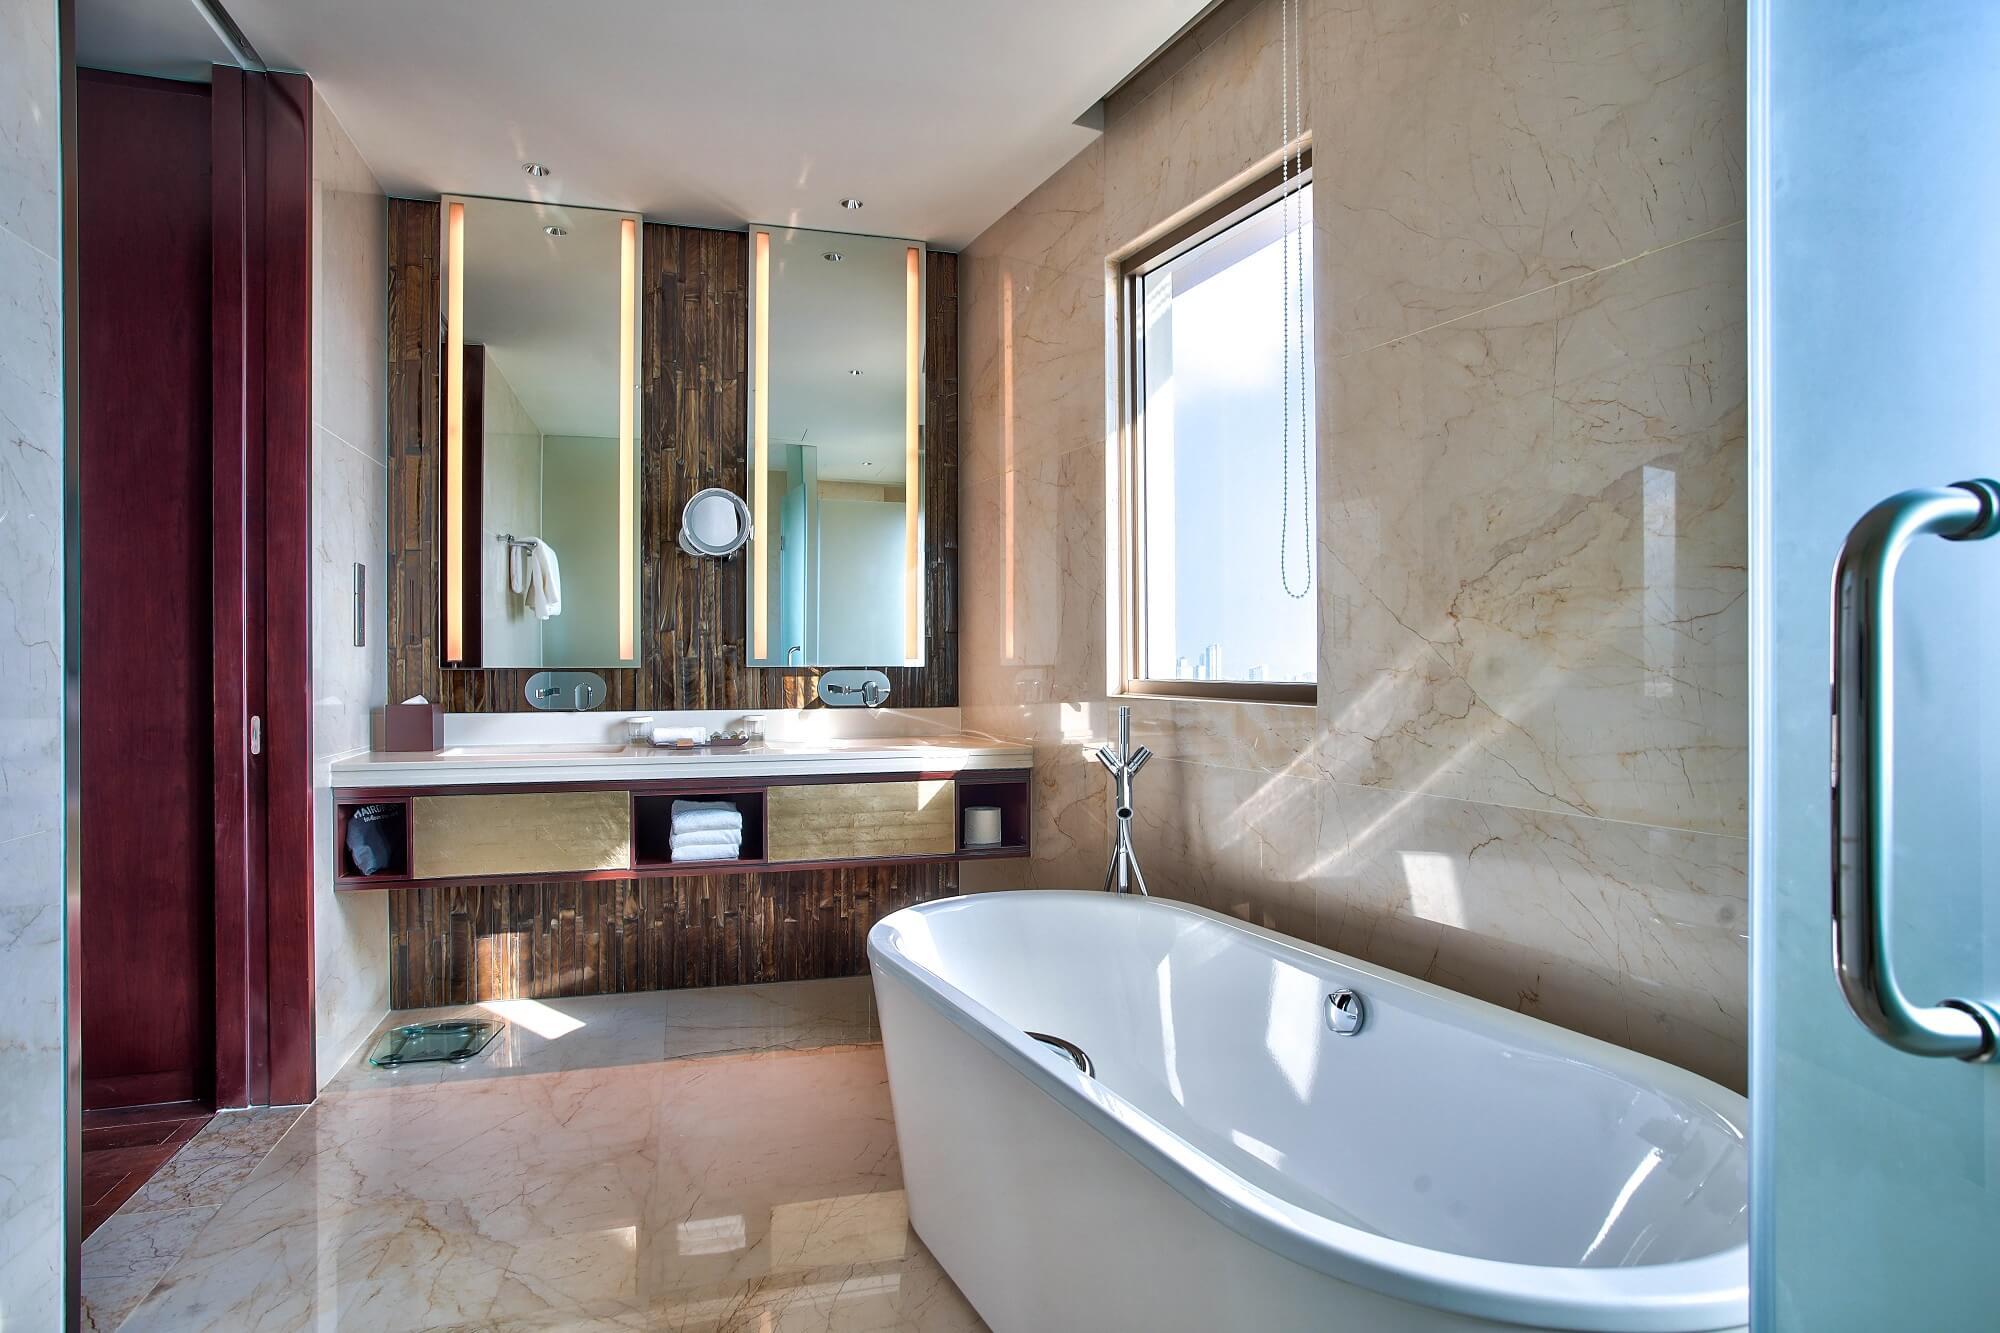 Suite Room Hilton Da Nang Trai Nghiem Khach San Day Phong Cach Giua Long Thanh Pho Danang Fantasticity 08